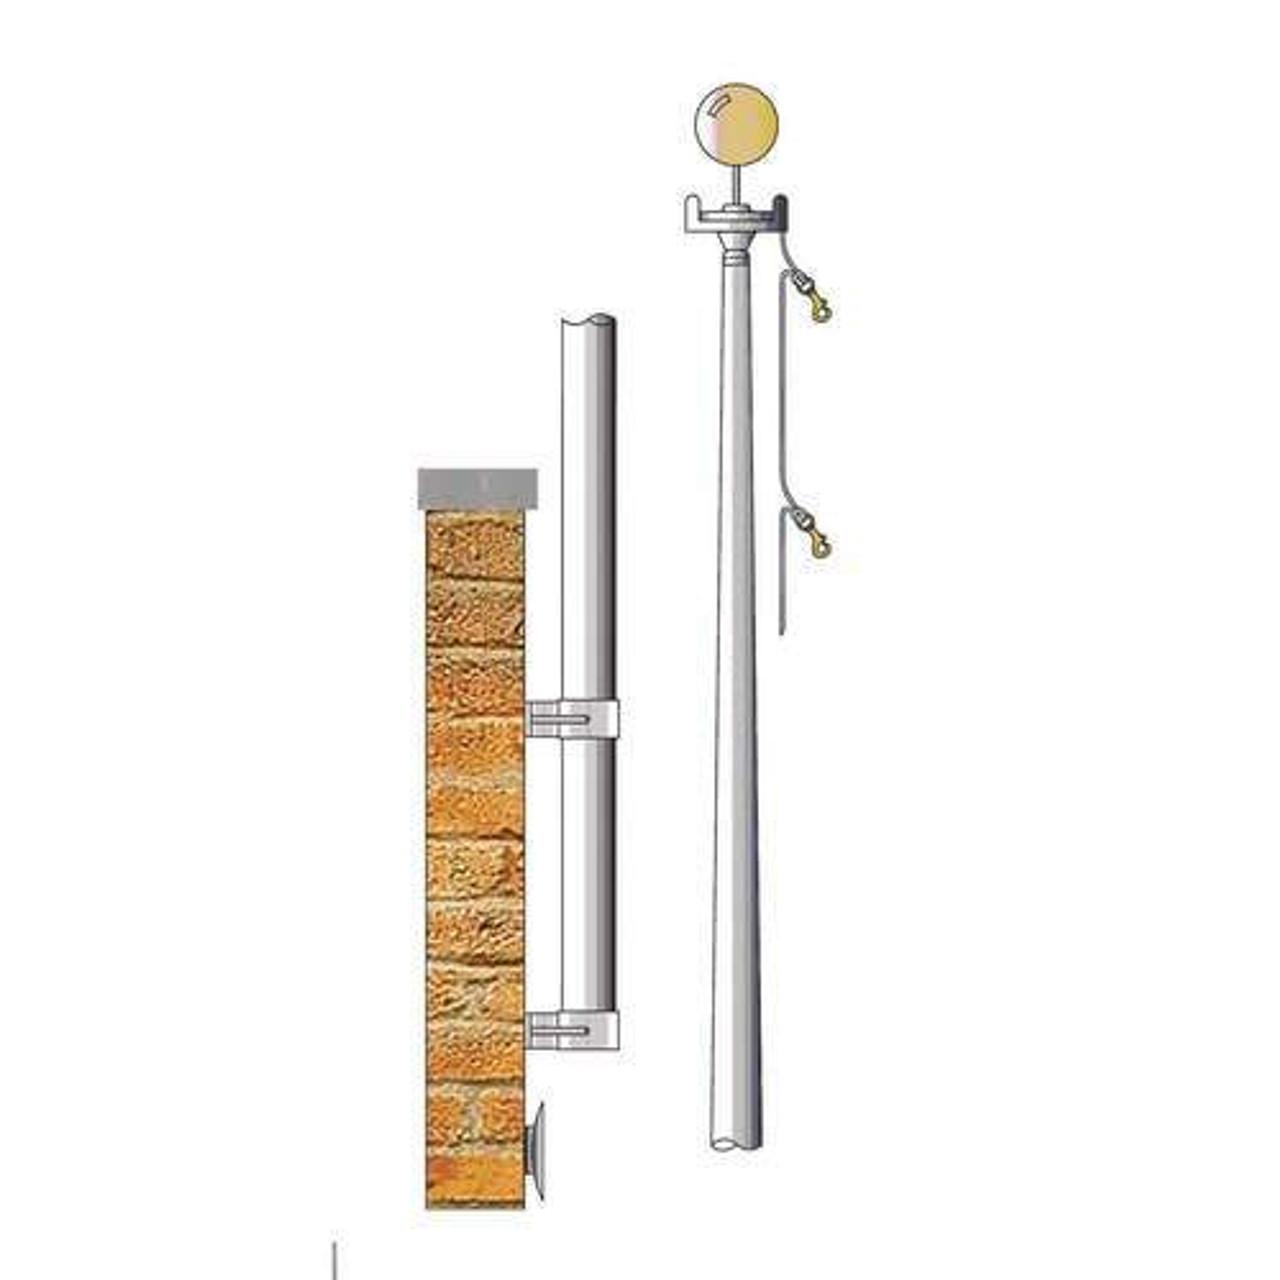 20 Vertical Wall Mounted Flagpole EVWAF20